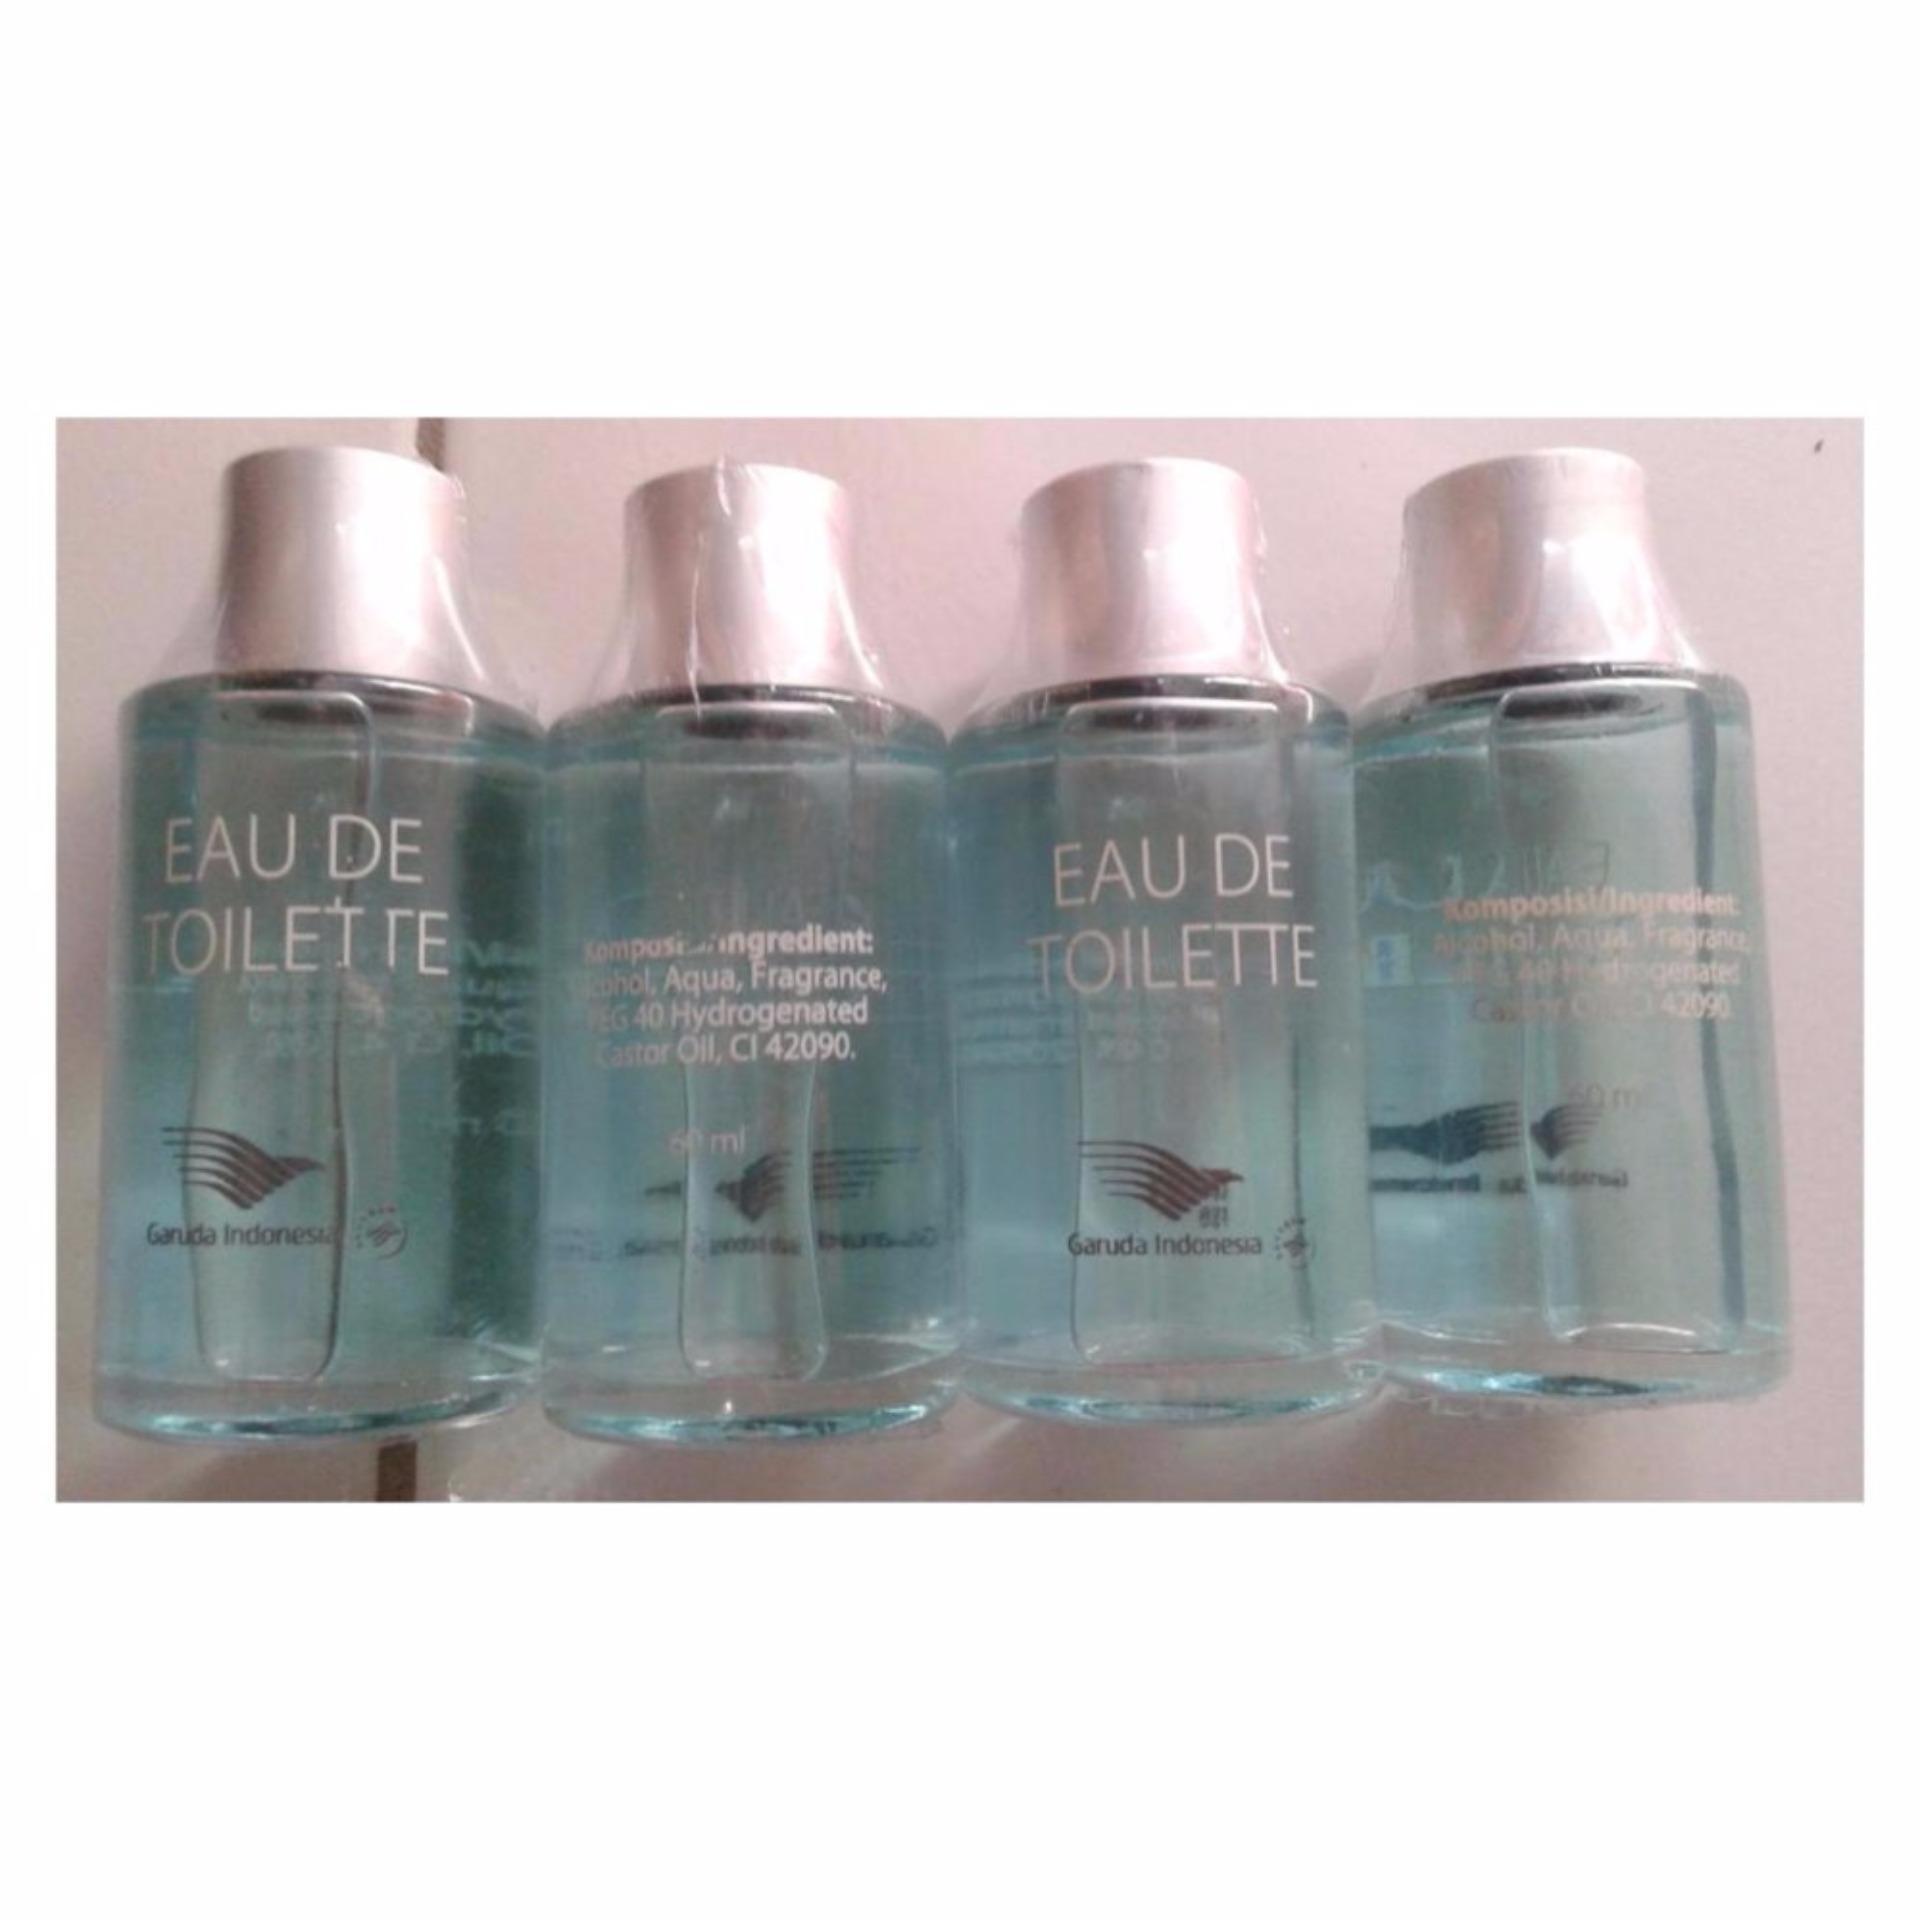 Perbandingan Harga Best Seller Parfum Eau De Toilette Edt Bos  Charlie White 100ml Maskapai Garudaindonesia 60ml